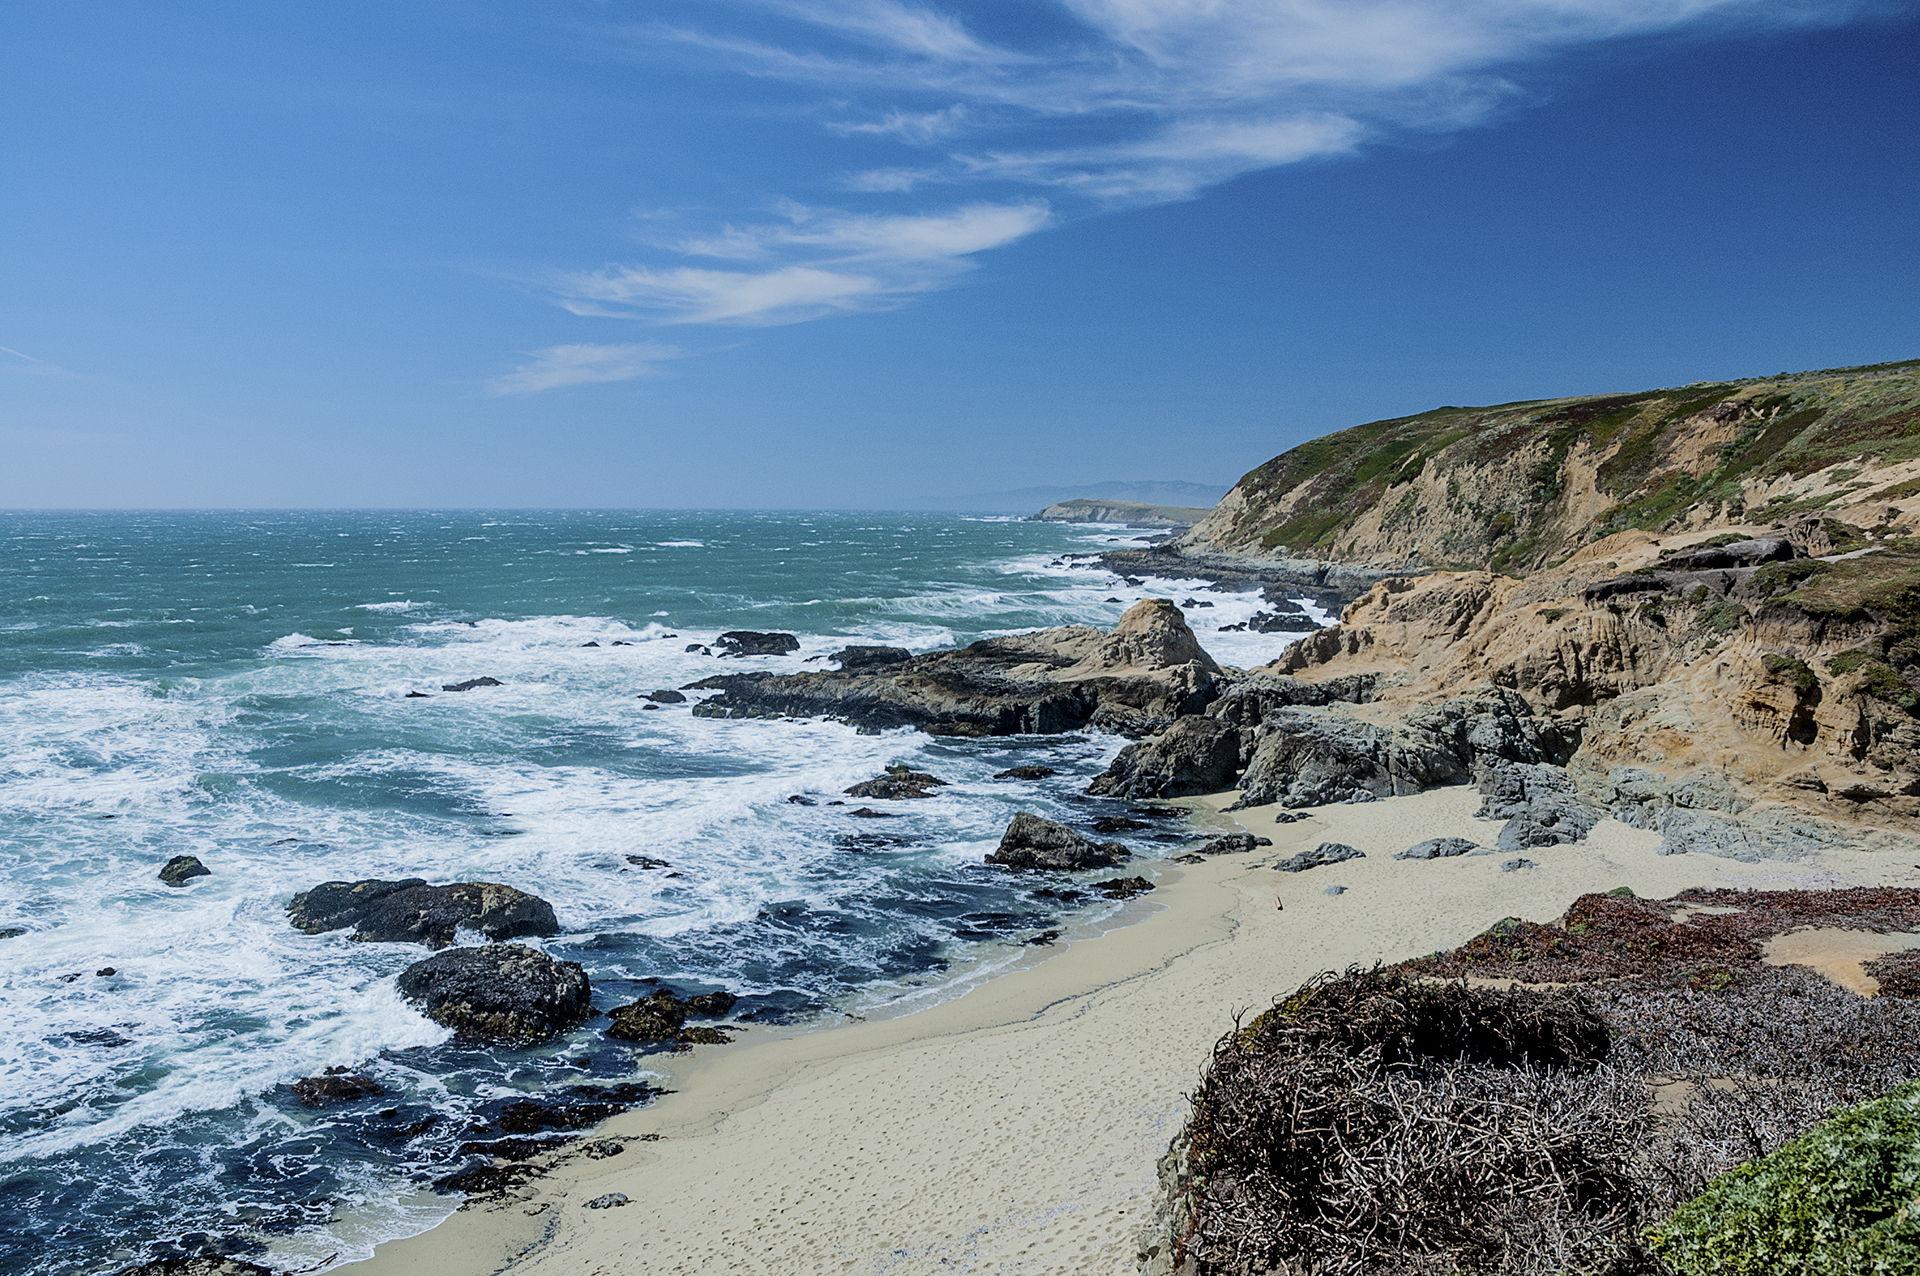 Goat Rock Beach, Jenner, Califórnia